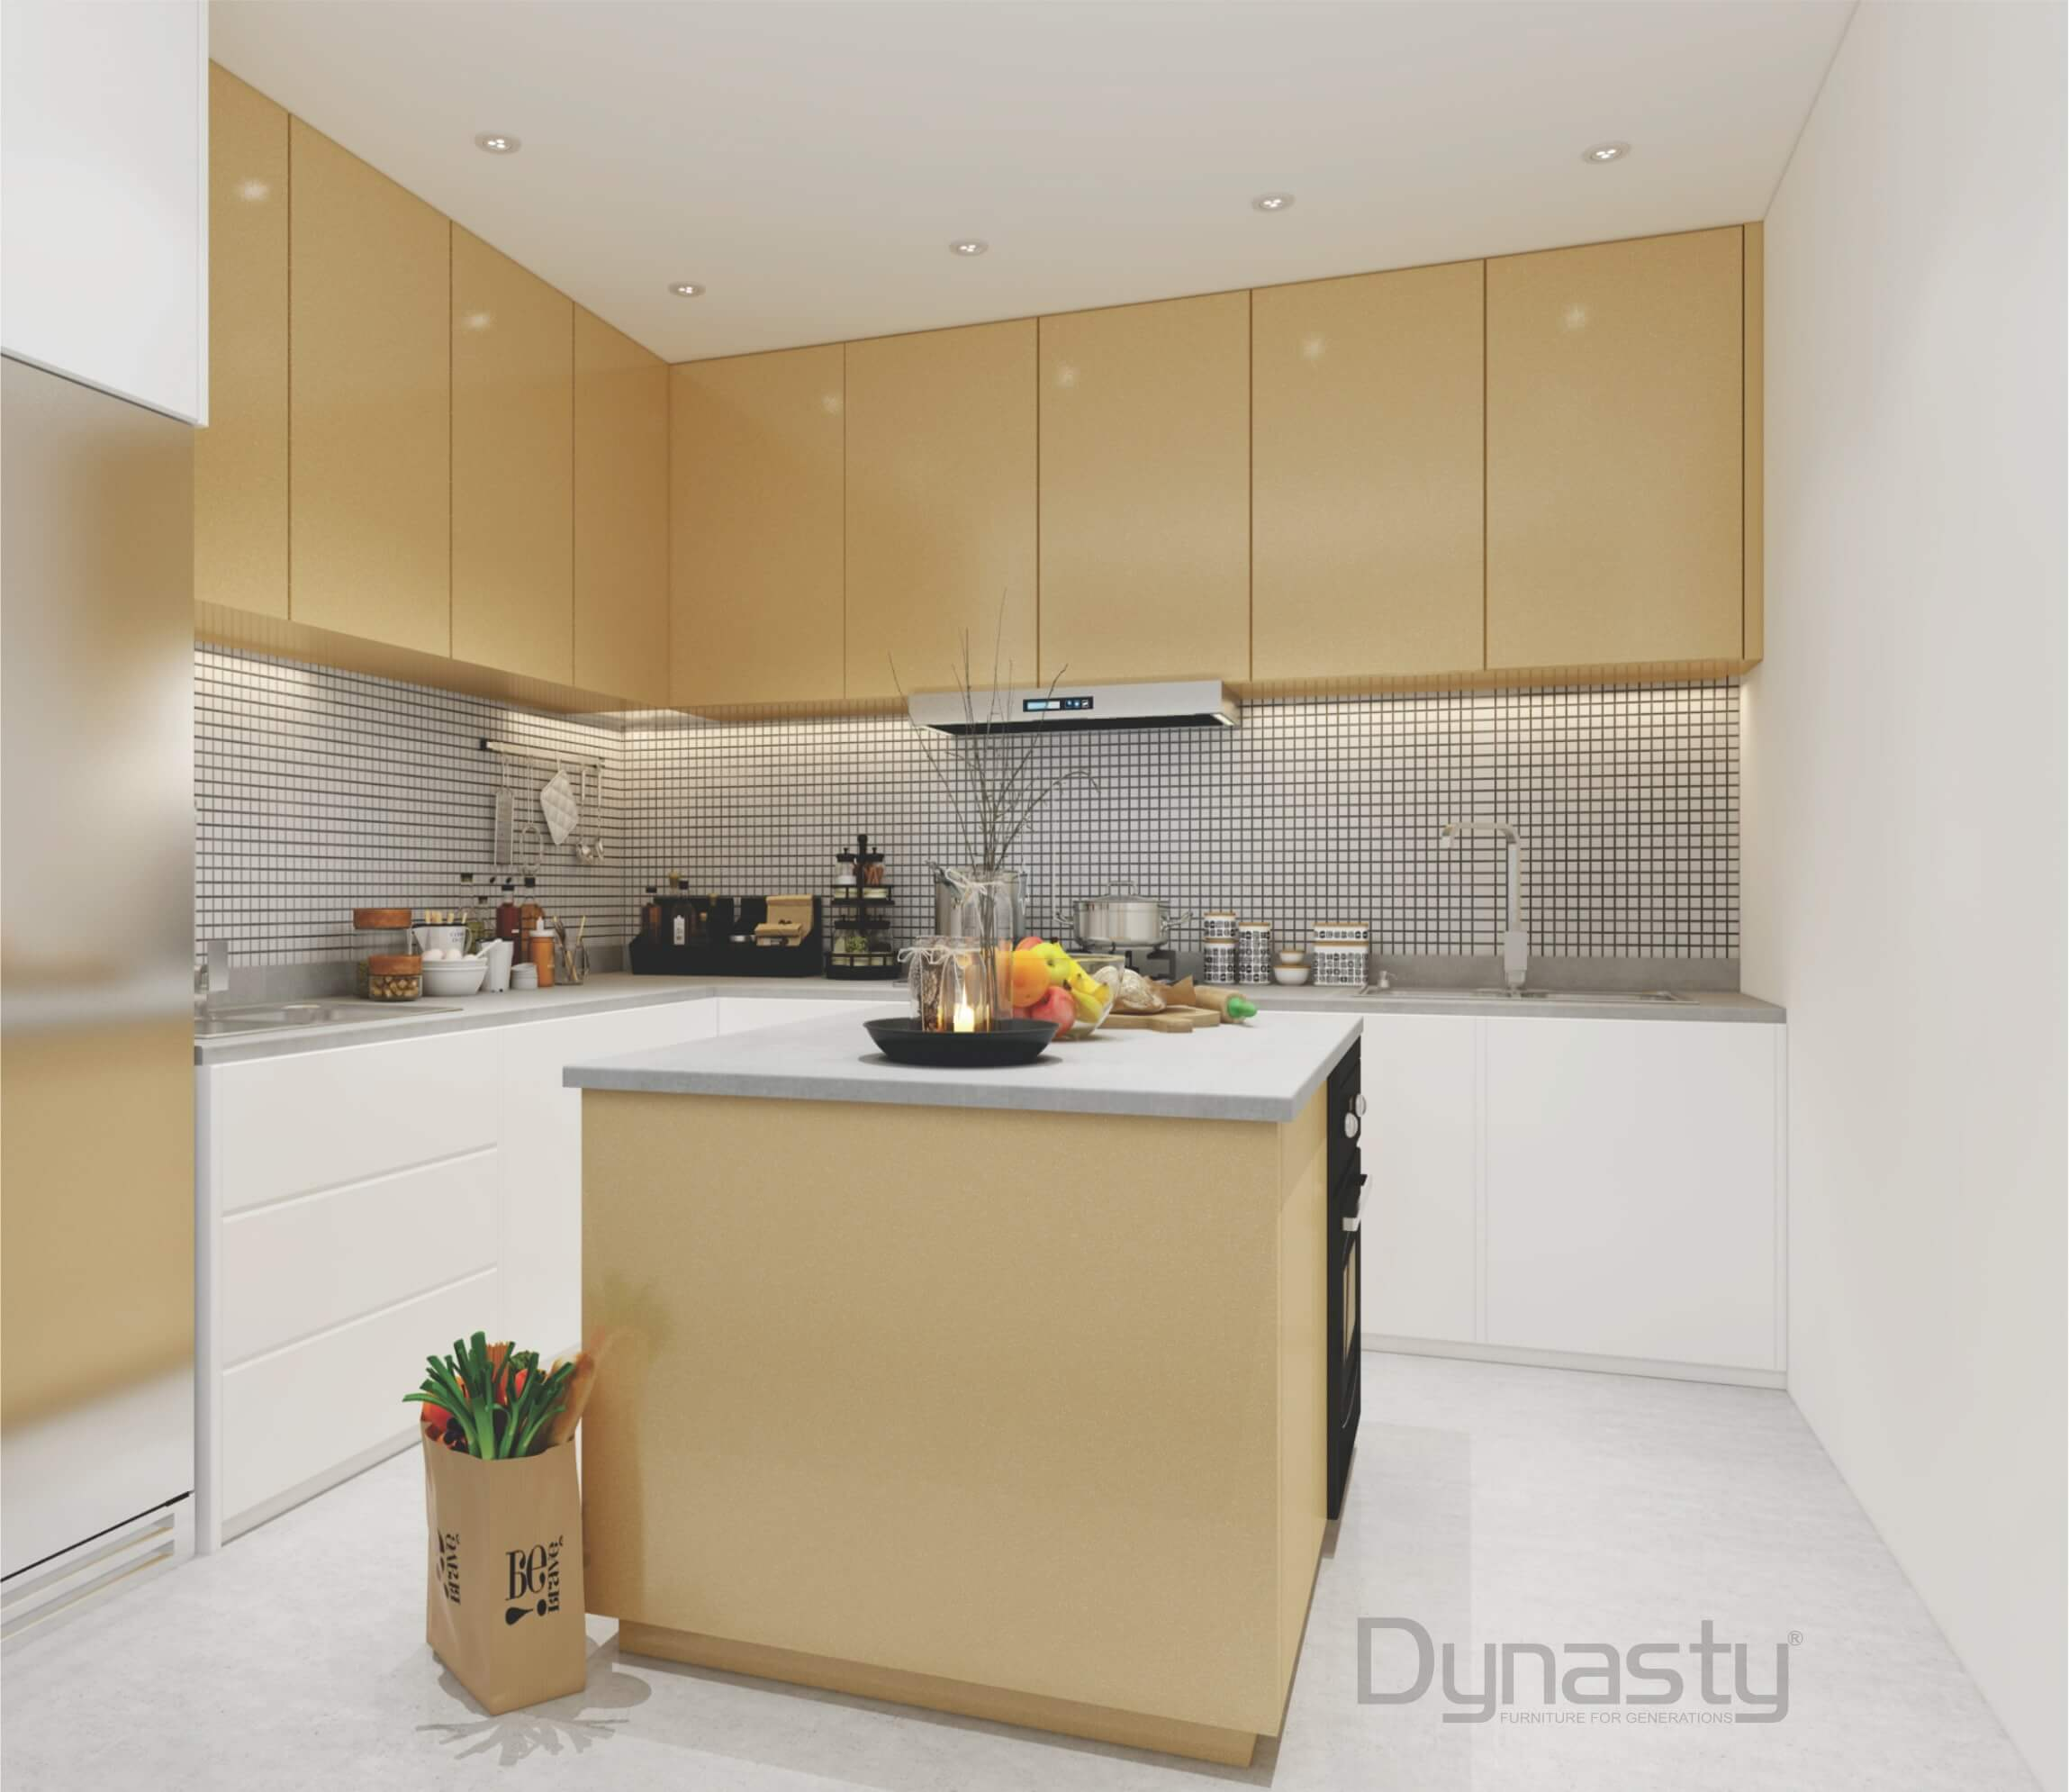 dynasty-aquatuff-kitchen-and-wardrobe-2